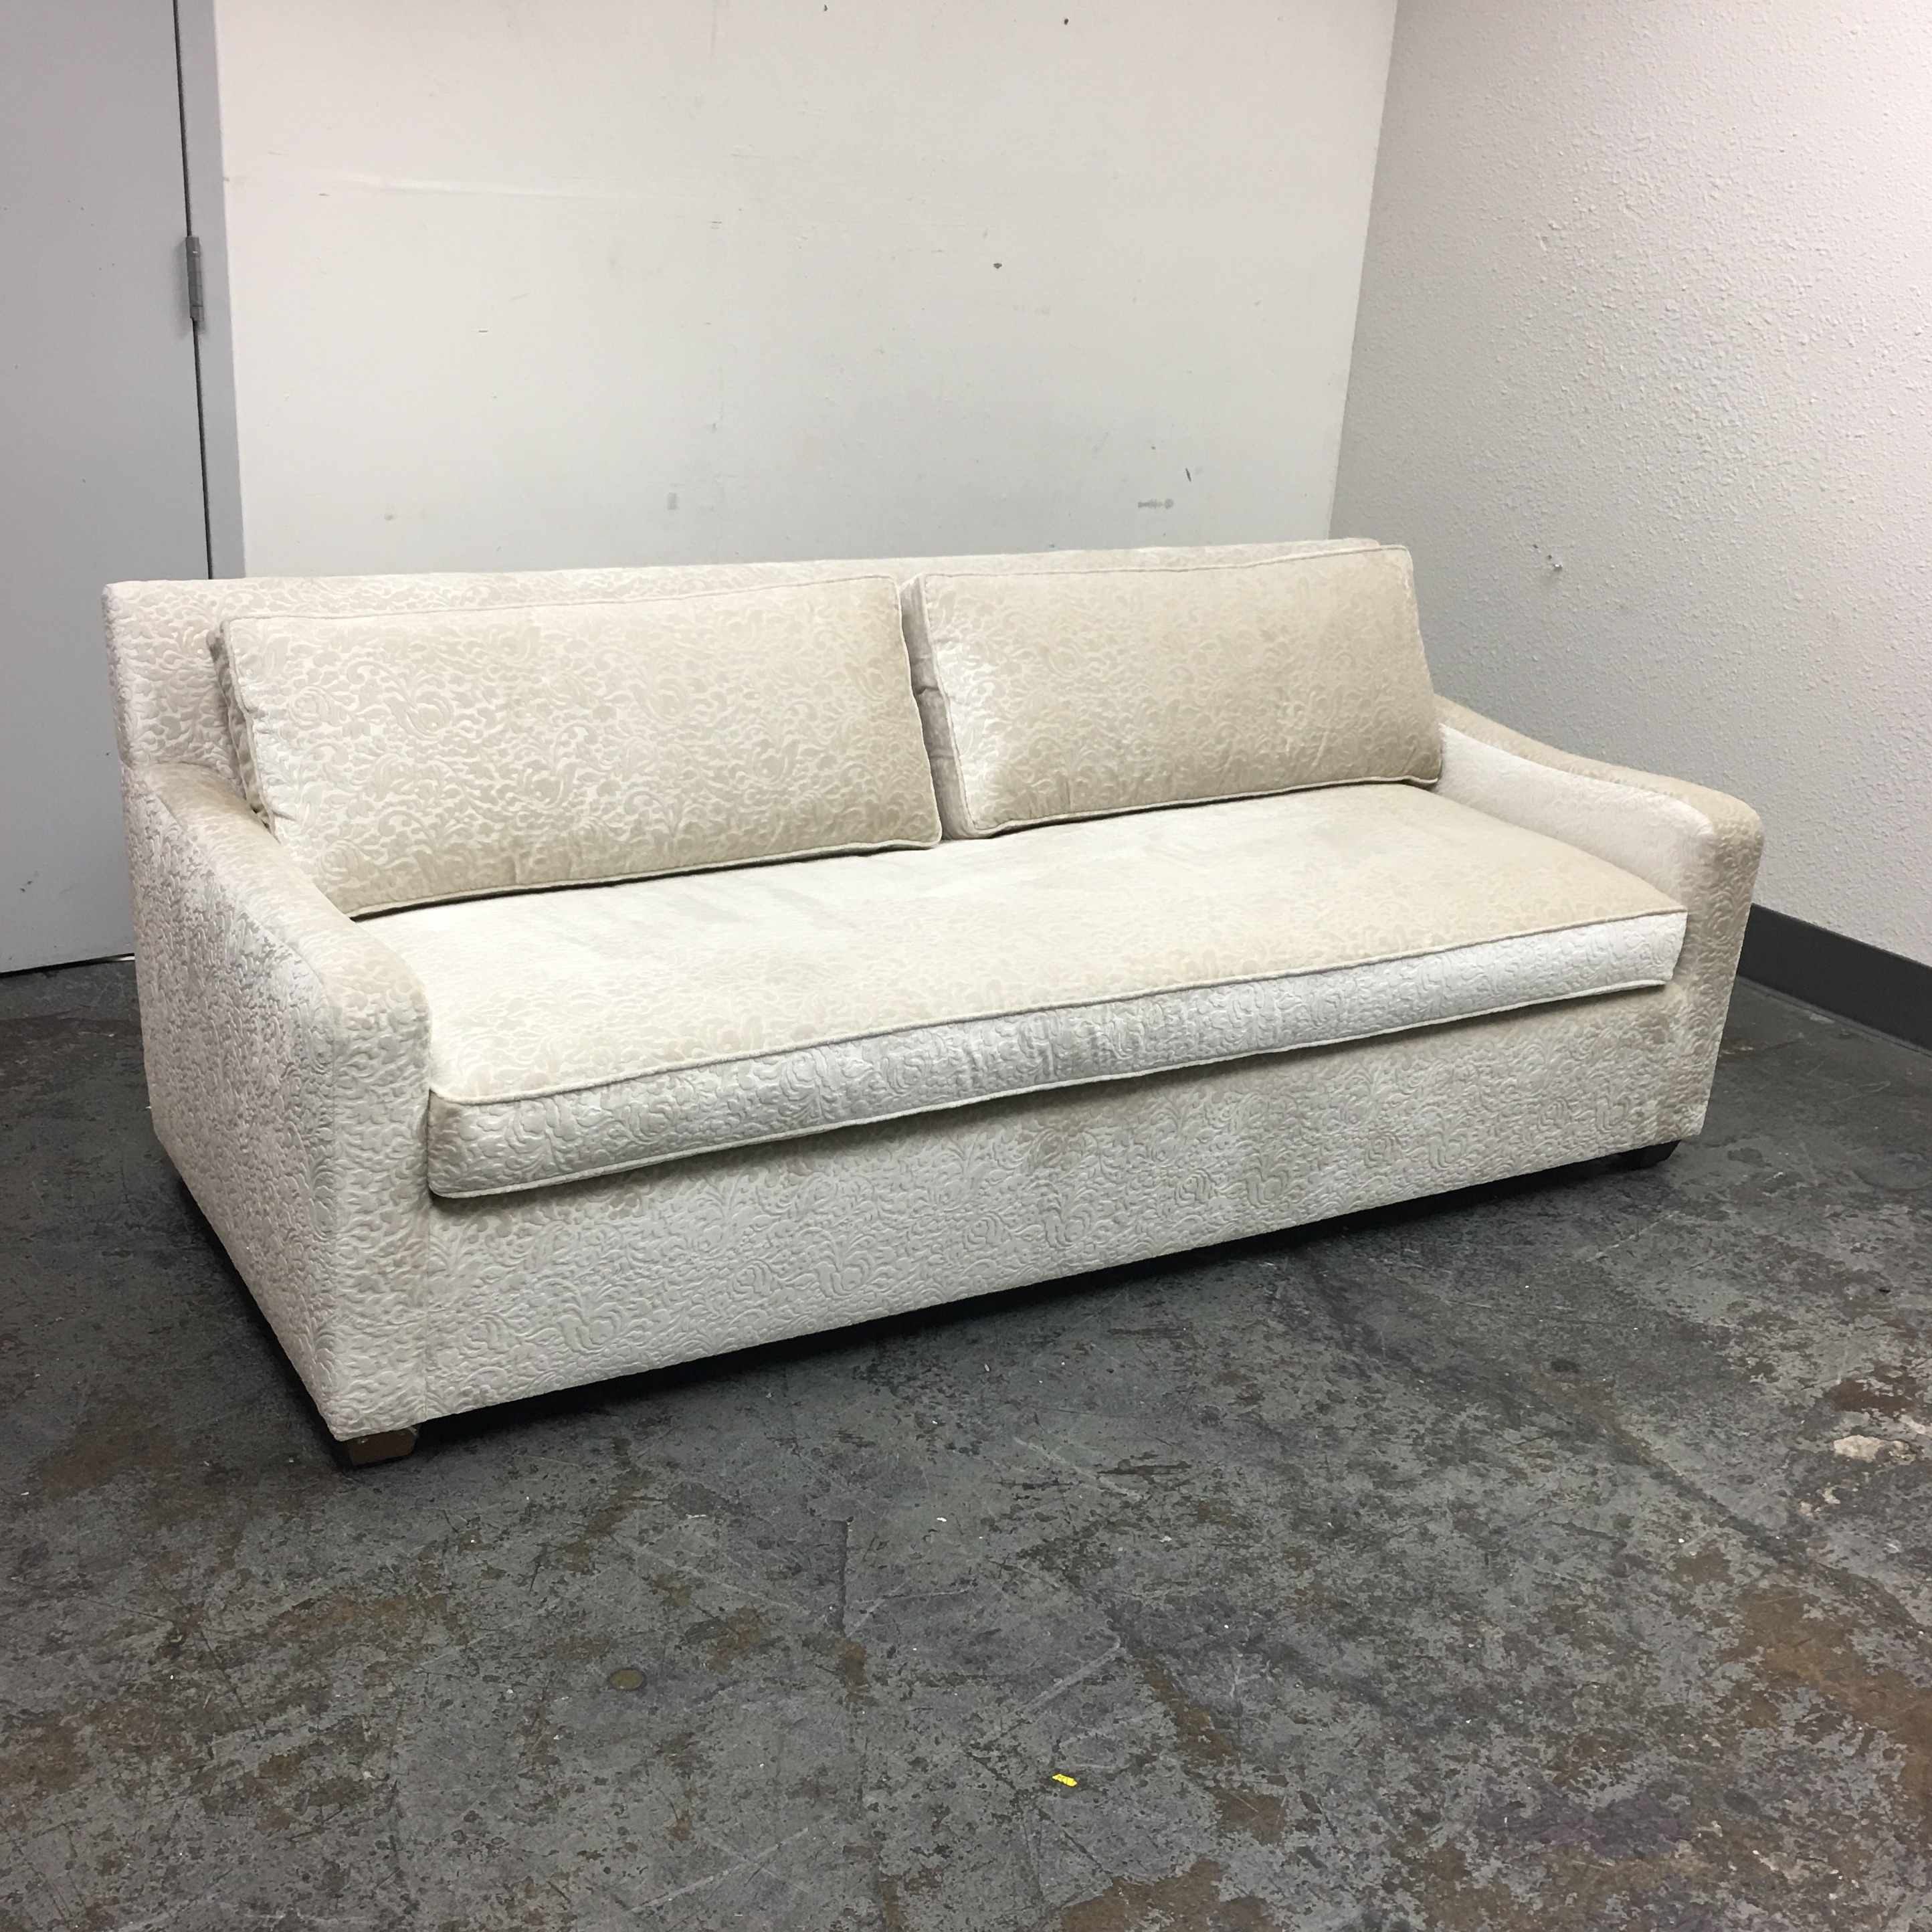 Fitzgerald Of San Francisco Off White Velvet Sofa   Image 8 Of 11